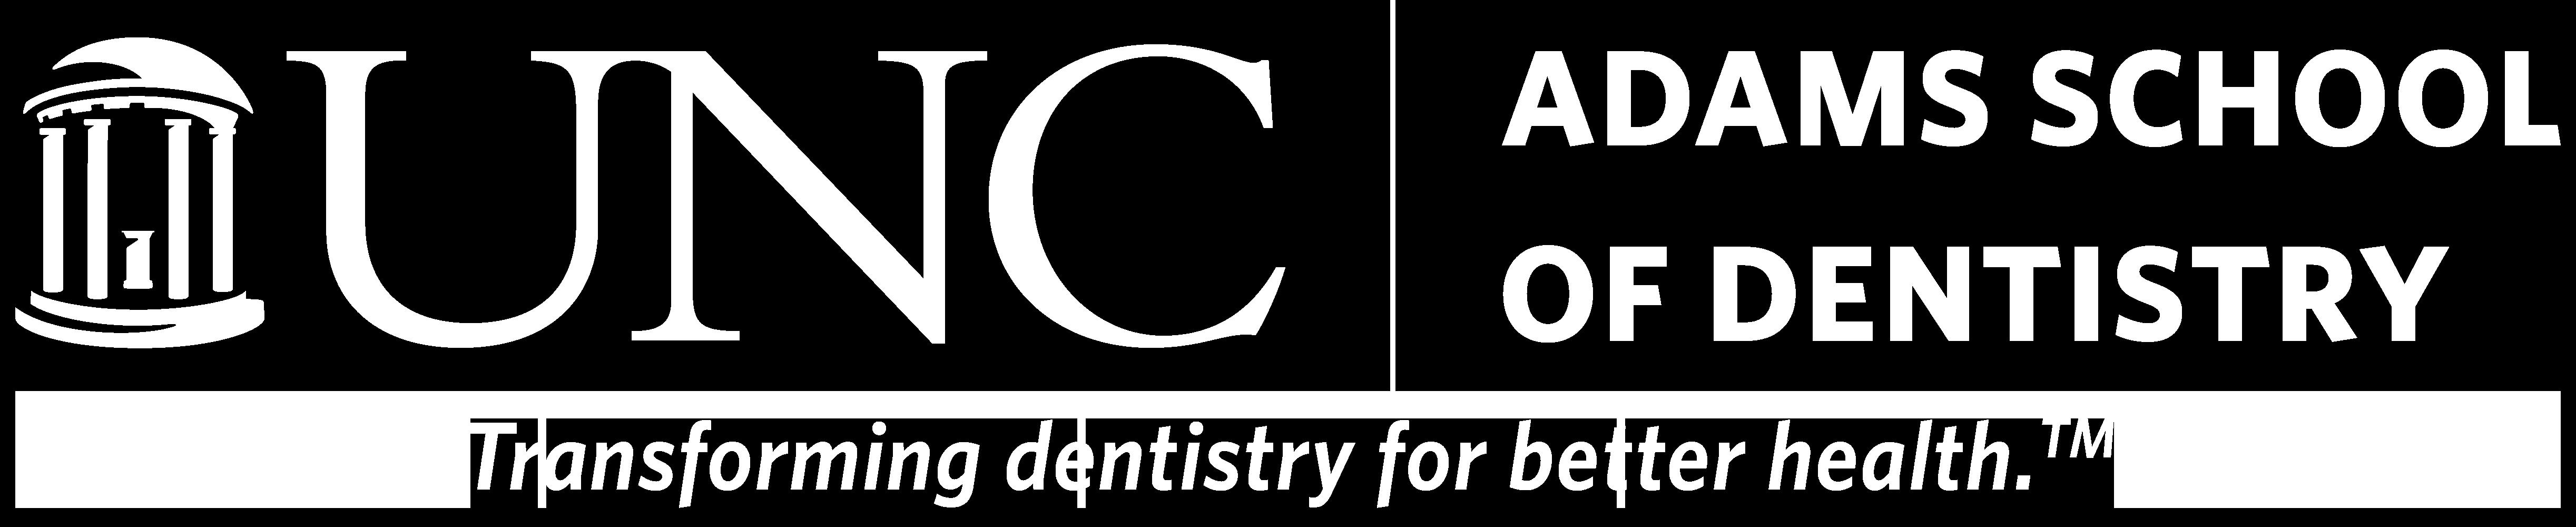 Adams School of Dentistry site home